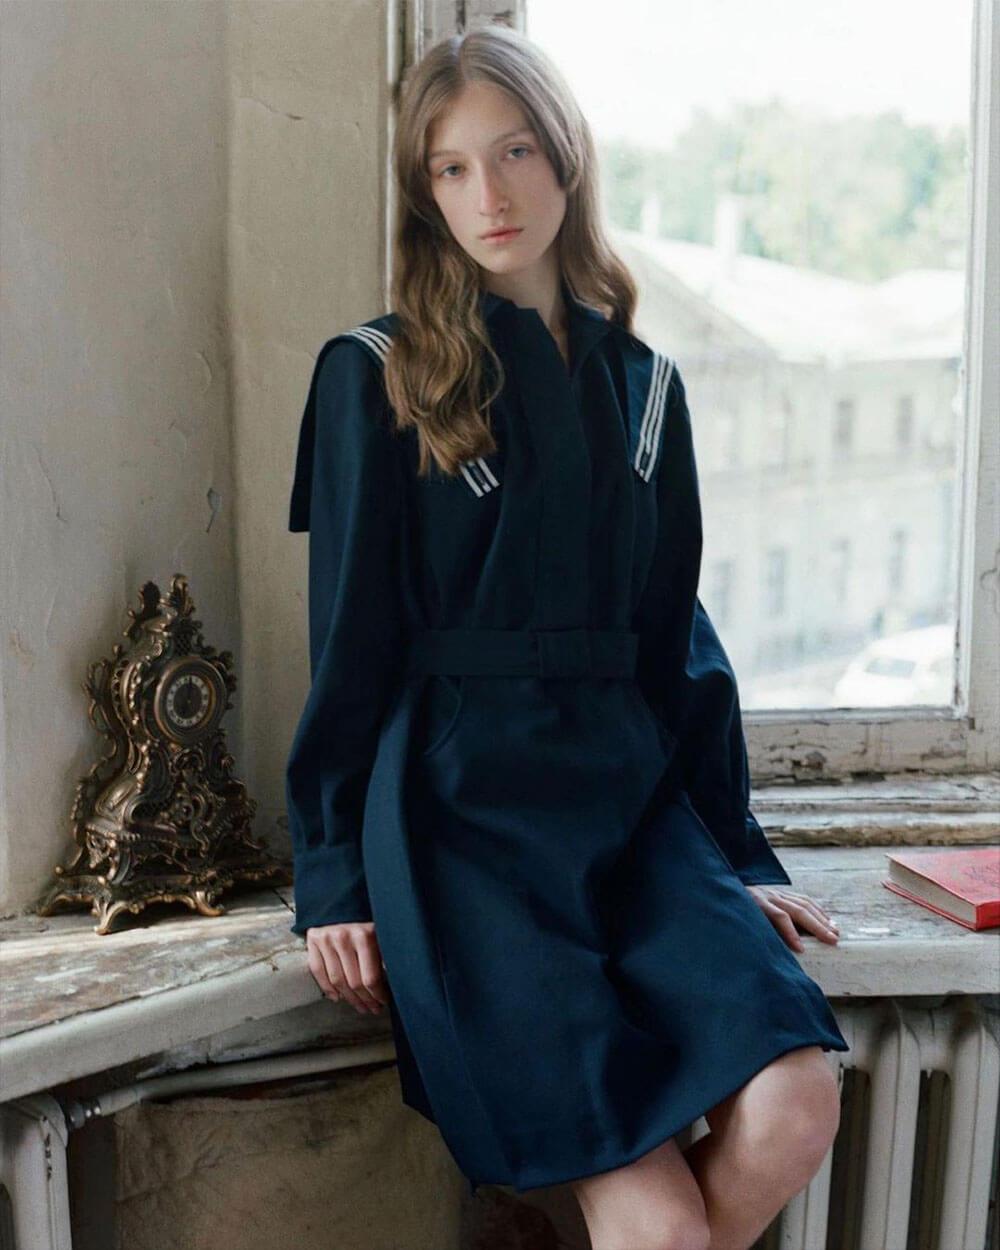 Gosha Rubchinskiy streetwear brands